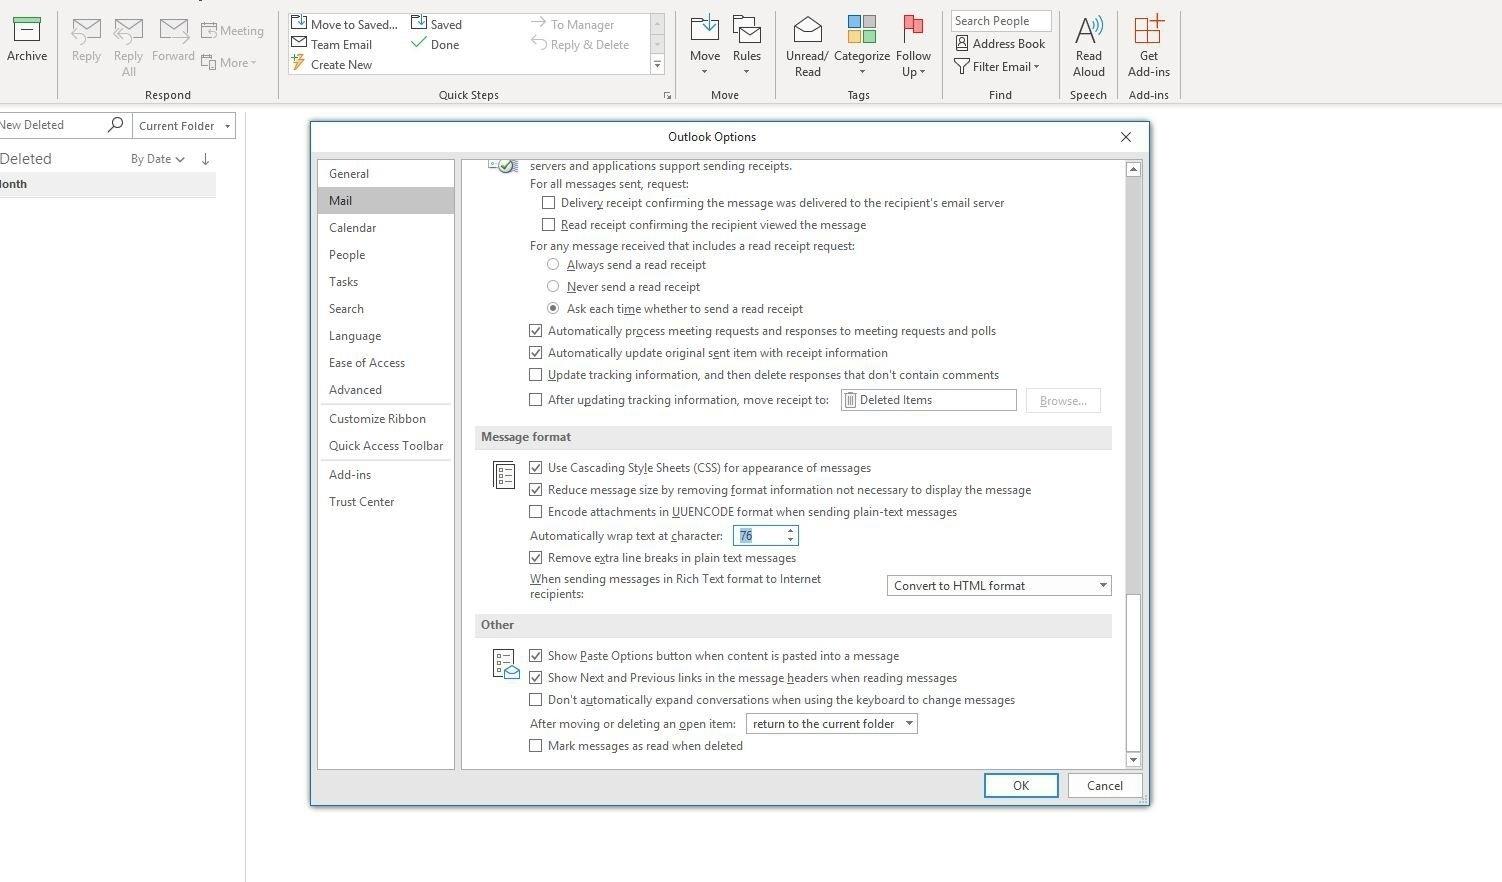 Outlook 2010 Calendar Printing Word Wrap | Calendar Design Ideas_Outlook 2019 Calendar Printing Word Wrap